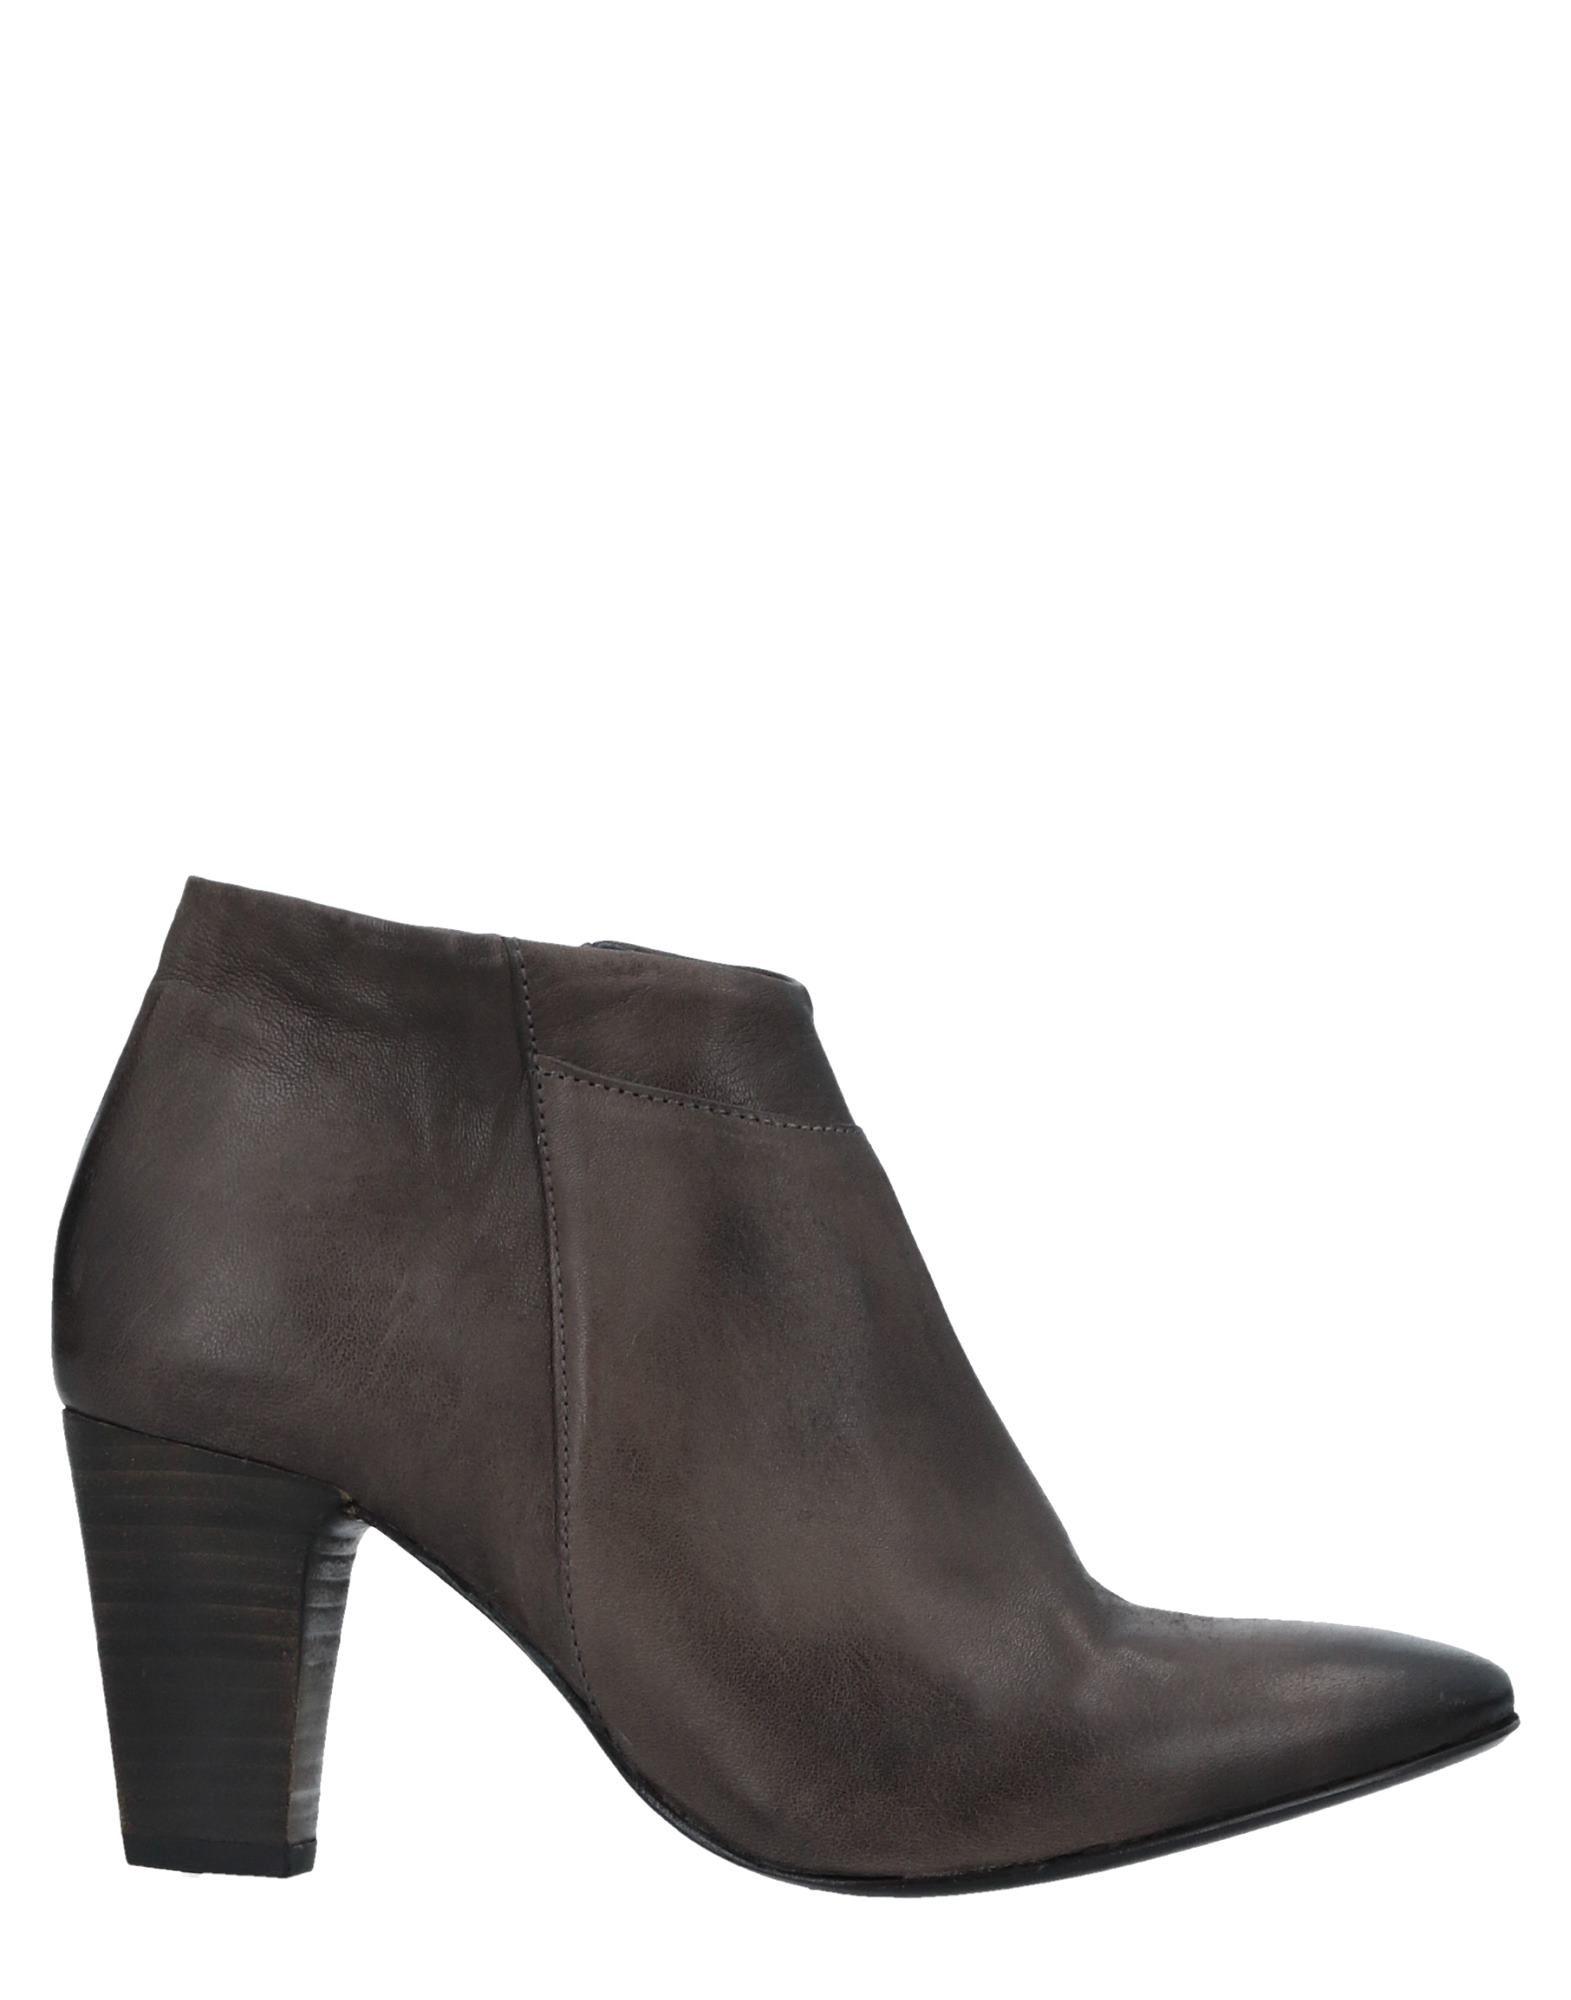 Creation Of Minds Stiefelette Damen  11512804JR Gute Qualität beliebte Schuhe